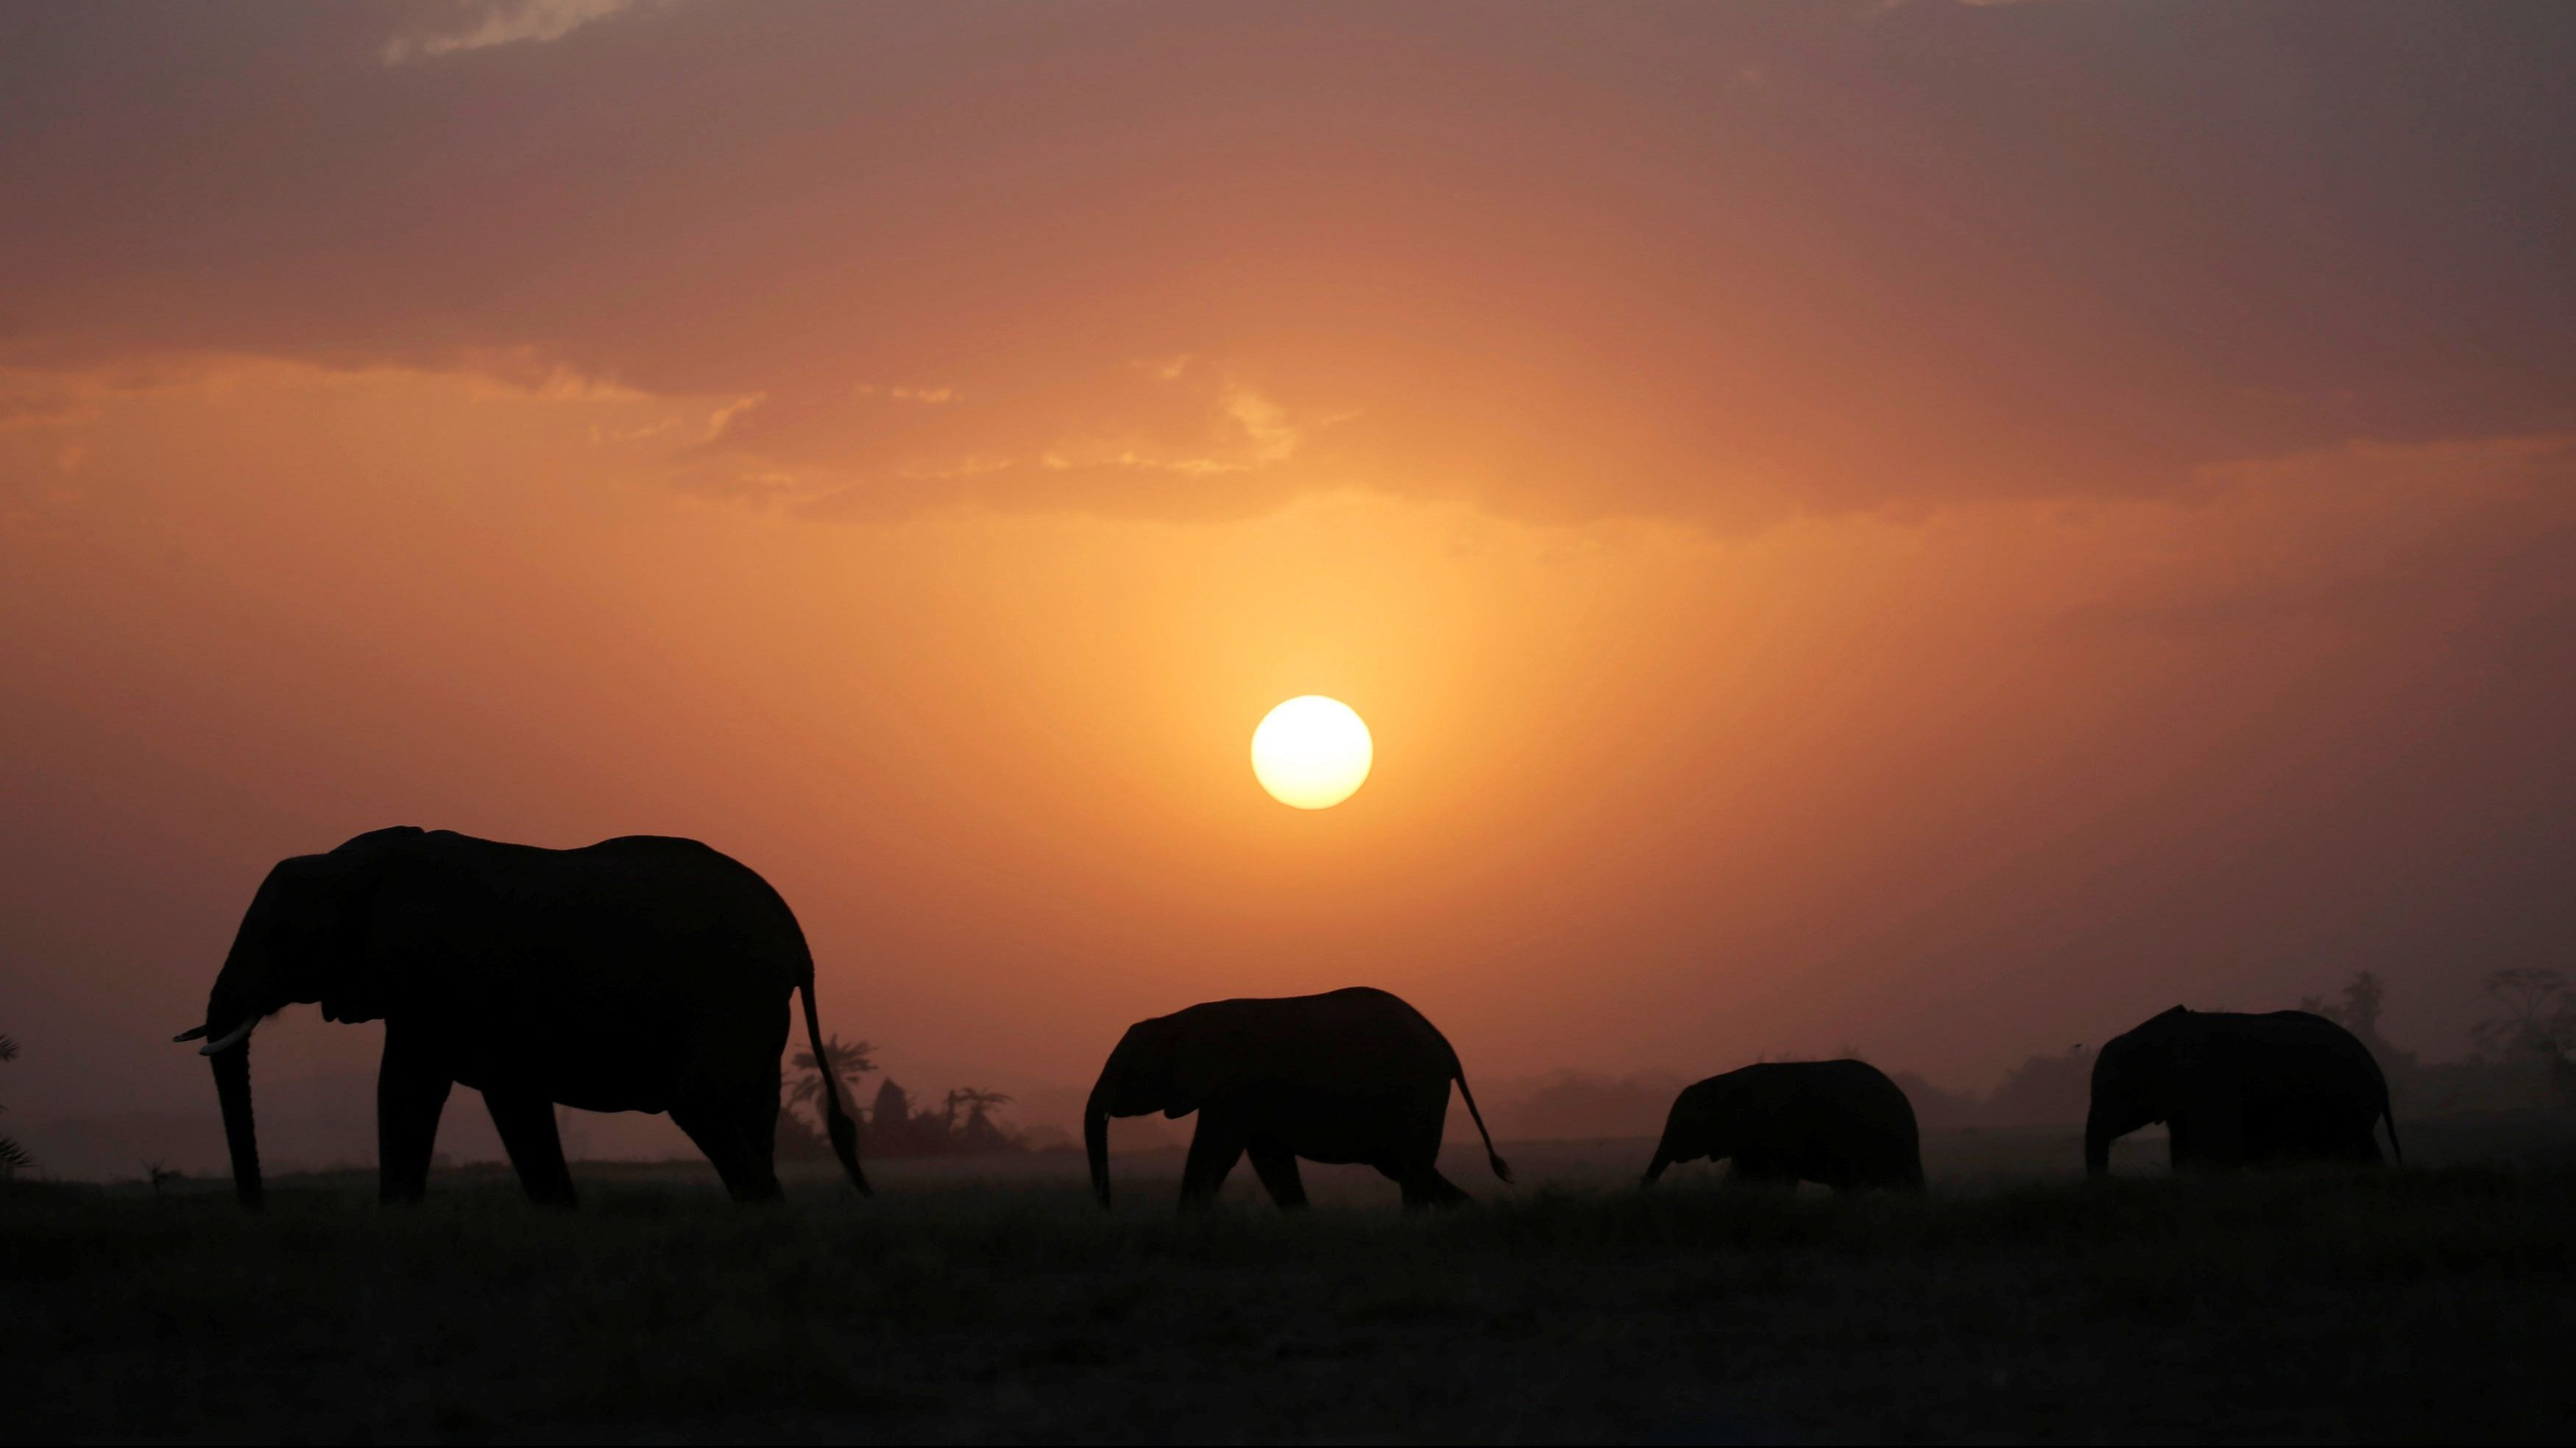 Elephant walk during sunset in Amboseli National park